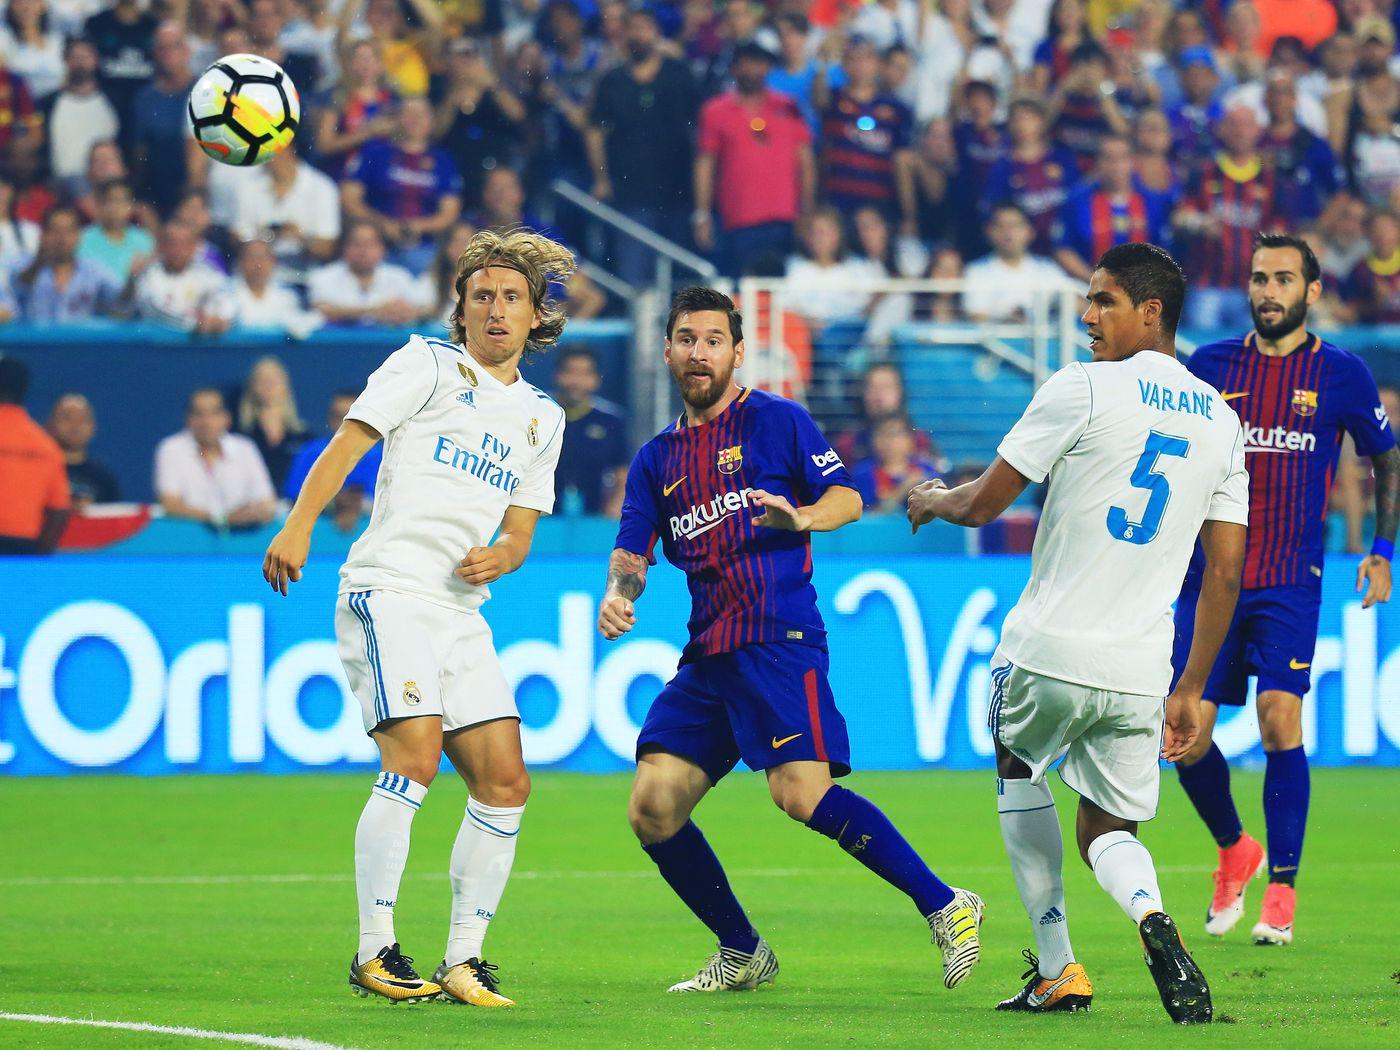 Barcelona Vs Real Madrid 2017 International Champions Cup Final Score 3 2 Barca Win Miami Clasico Barca Blaugranes